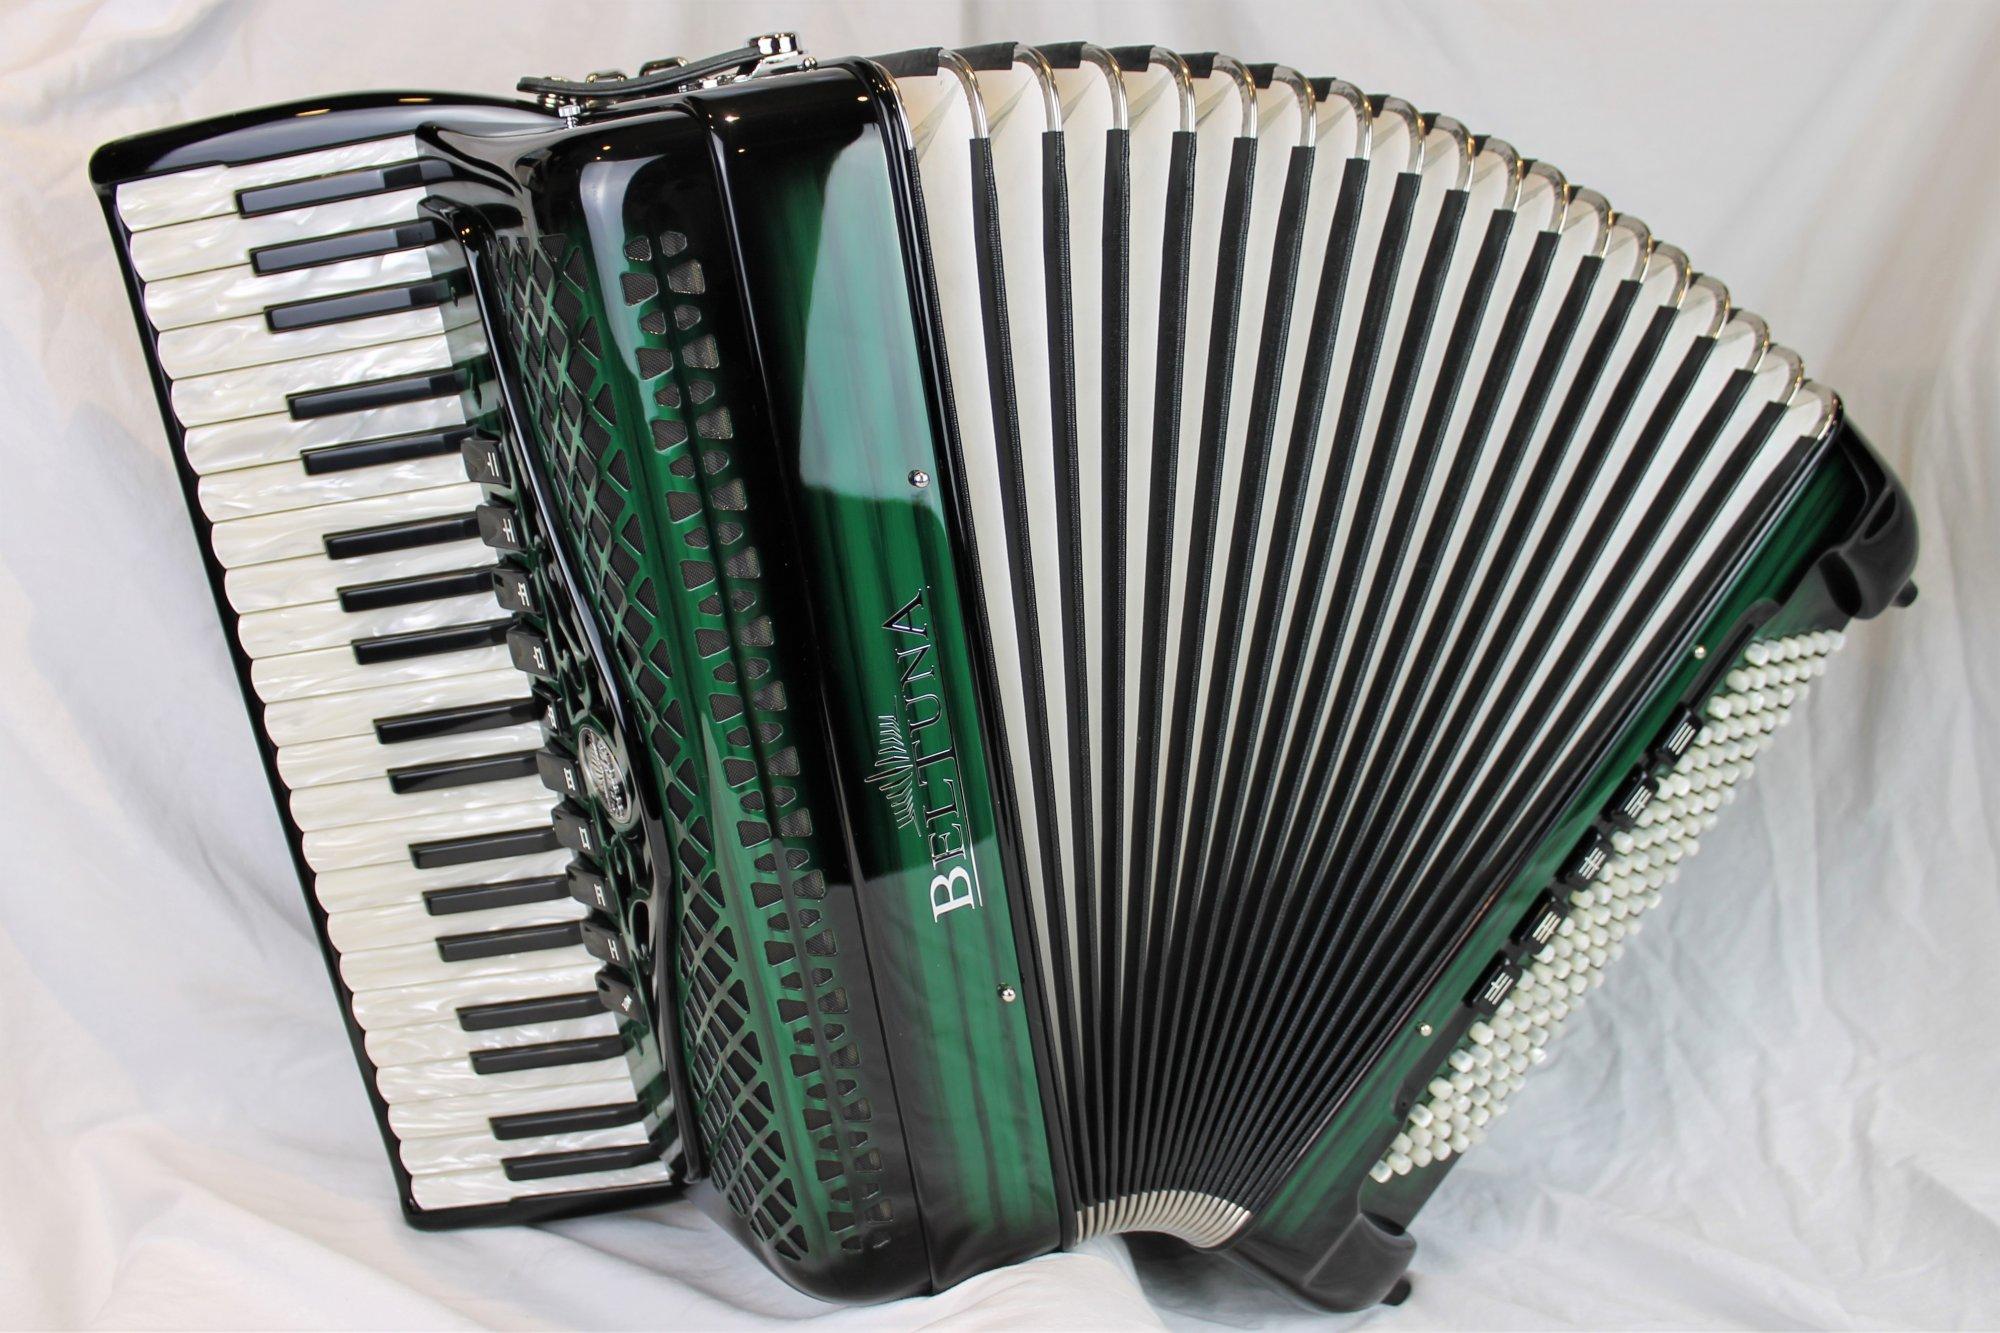 NEW Green Shadow Beltuna Studio IV Compact Piano Accordion LMMM 41 120